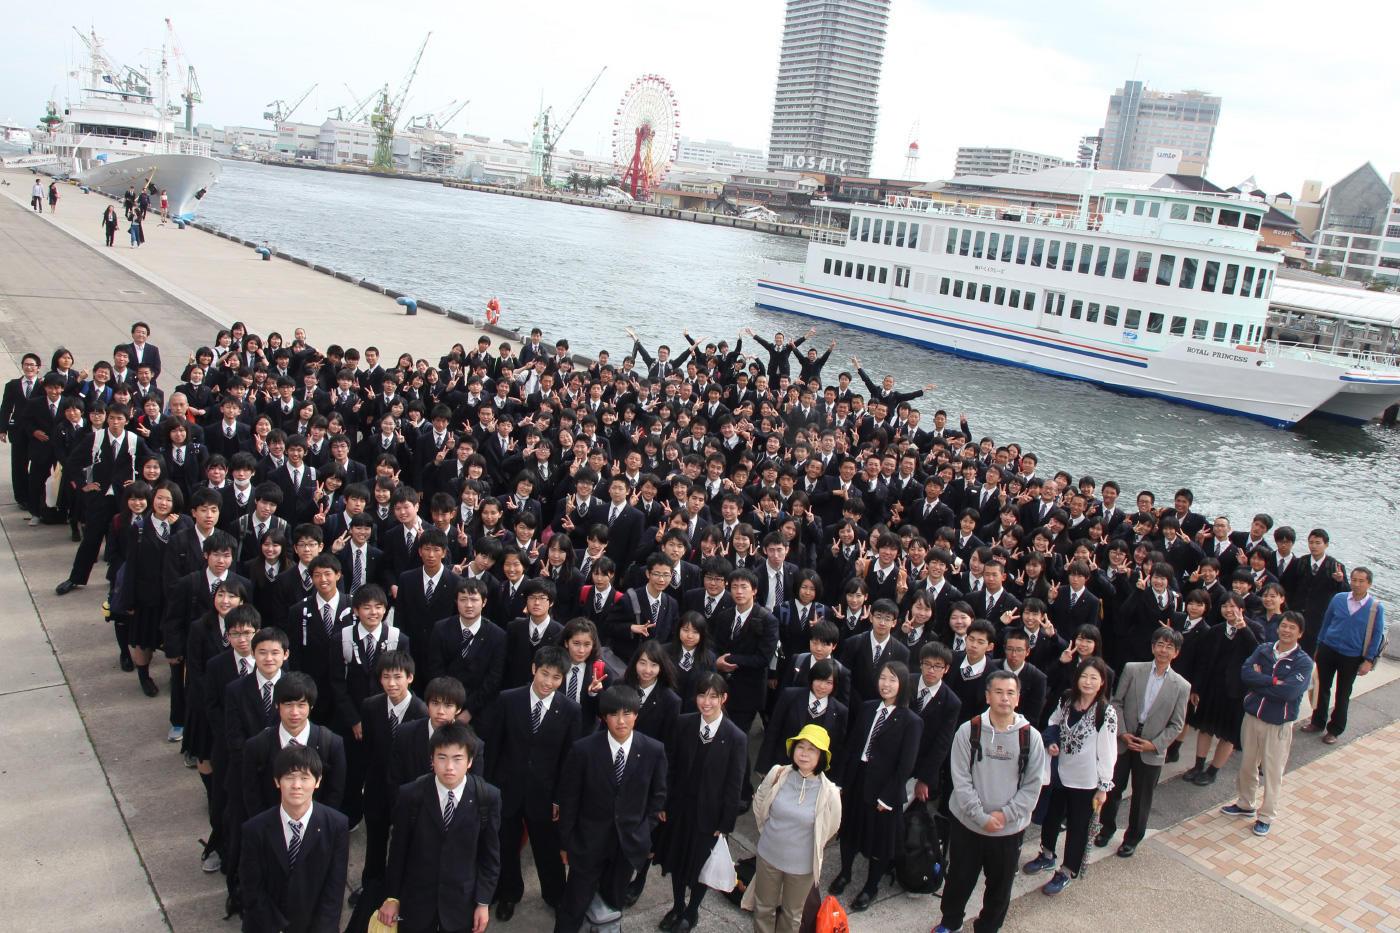 http://www.kyoto-be.ne.jp/nishijyouyou-hs/mt/schoollife/images/20170425_3nen_img_2479.jpg